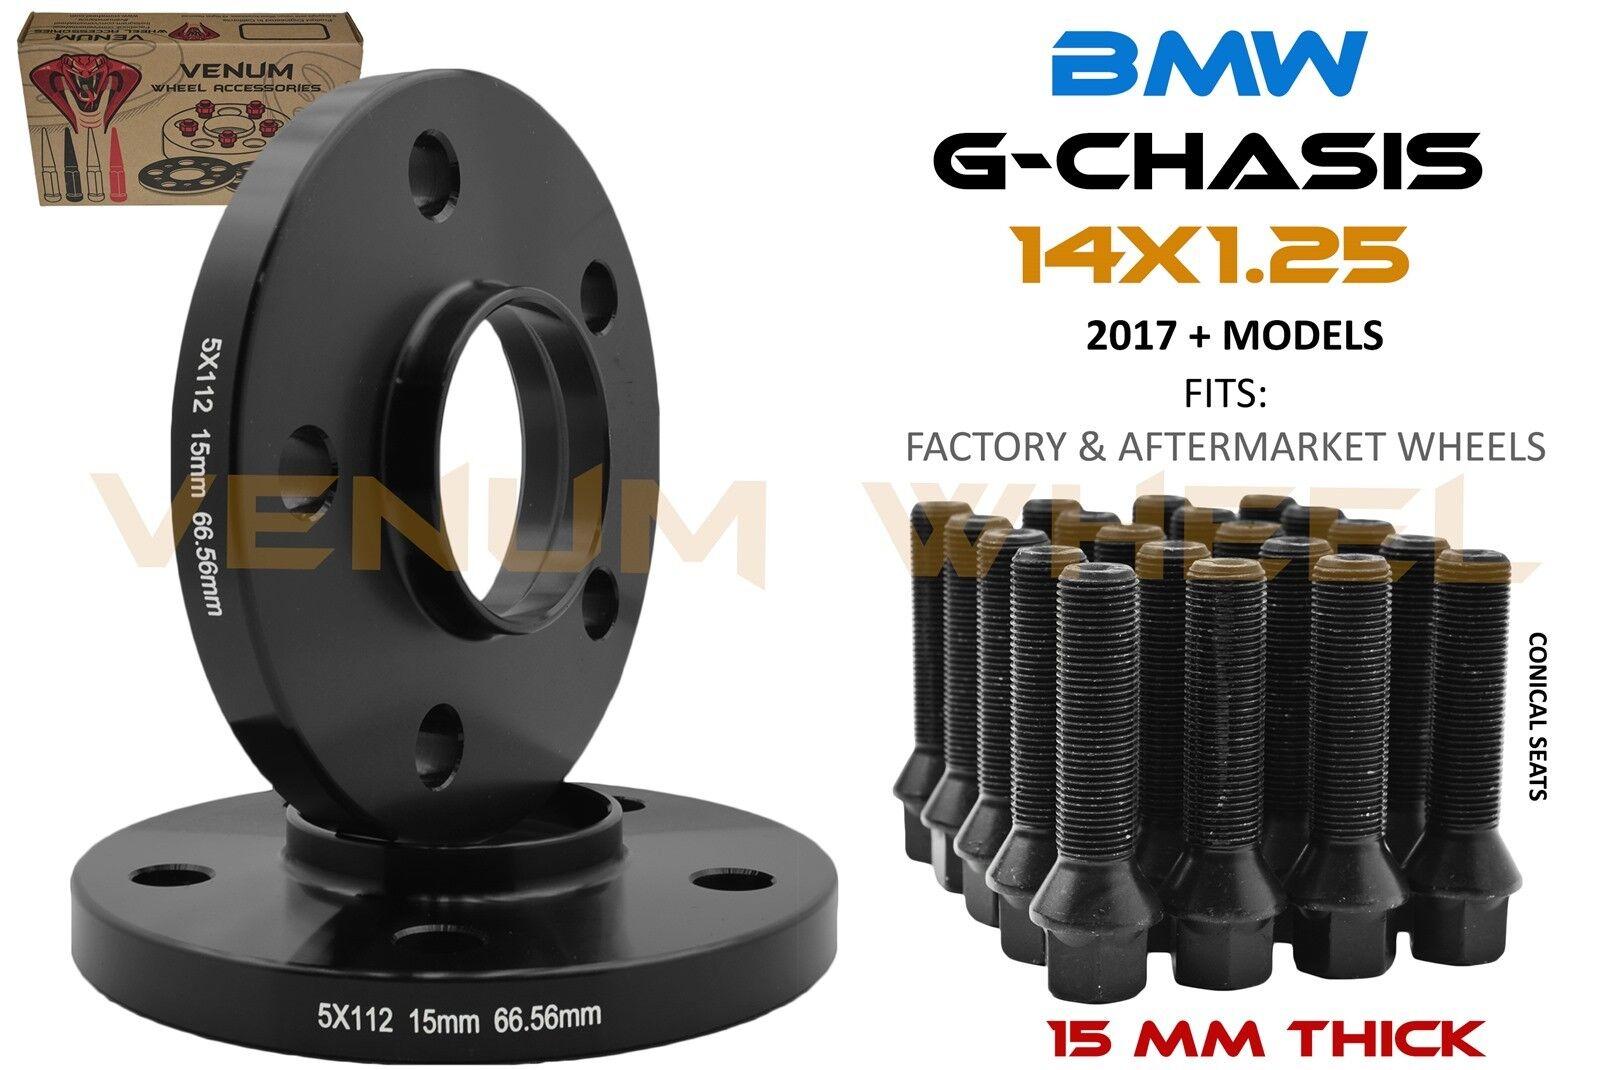 4 17mm Hub Centric Wheel Spacers 5x112 Mercedes 12x1.5 Black Lug Bolts 66.56 CB